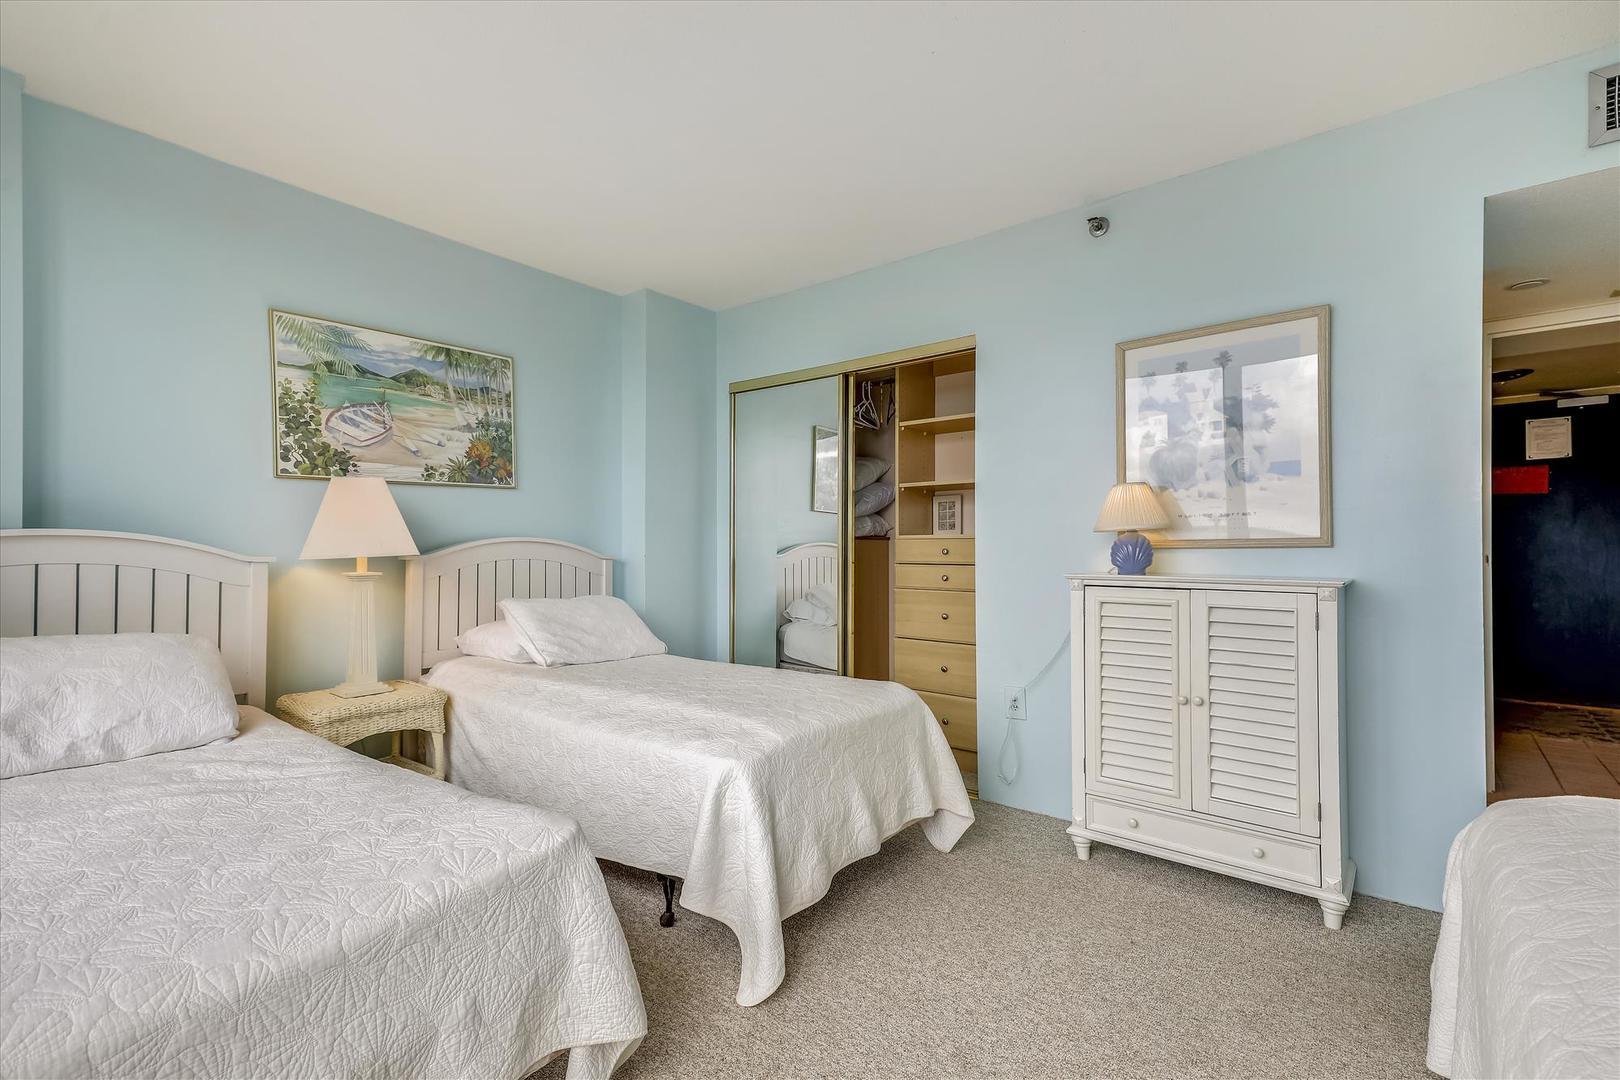 Century I 719 - Lower Level Bedroom